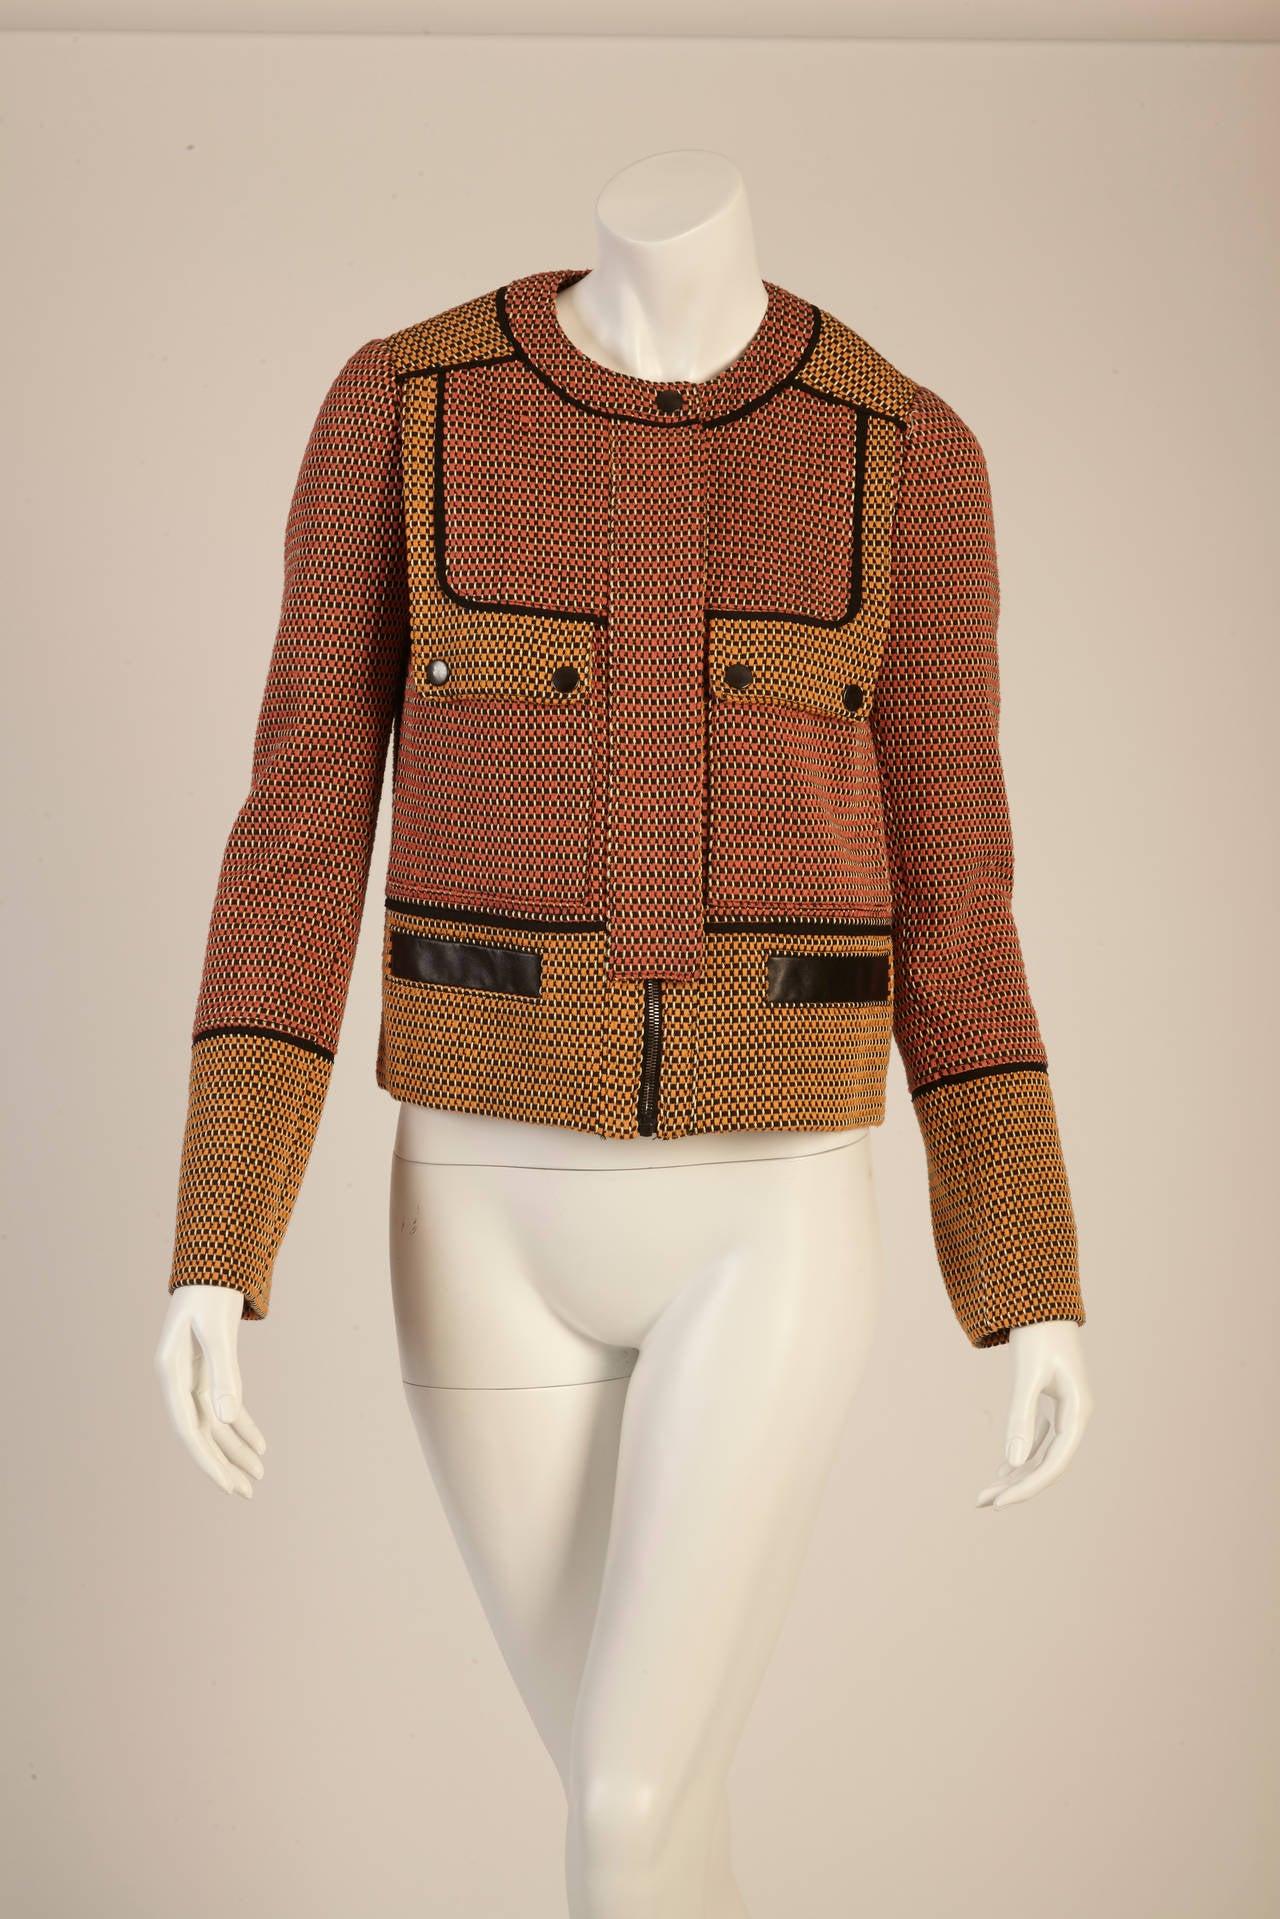 Proenza Schouler Multi-Color Jacket 2